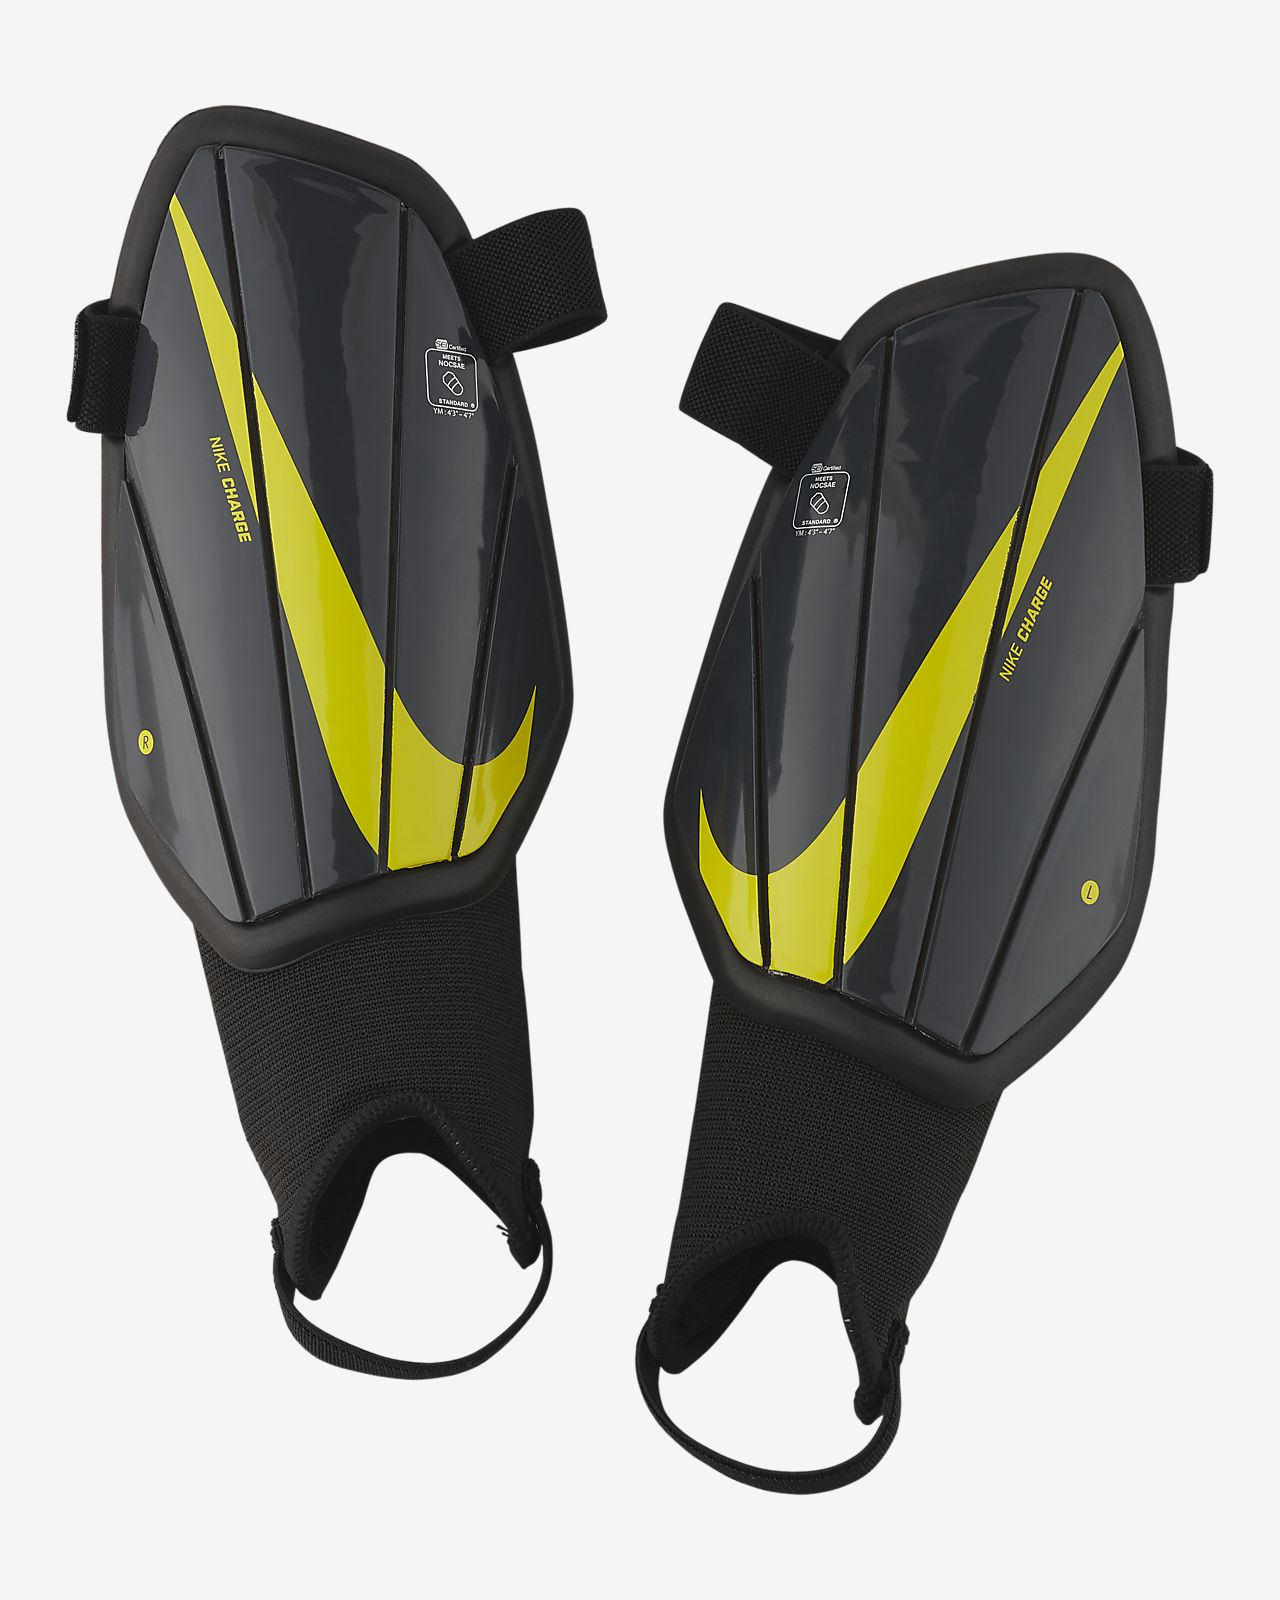 3dcc46a4c13de Nike Charge Espinilleras de fútbol - Niño a. Nike.com ES